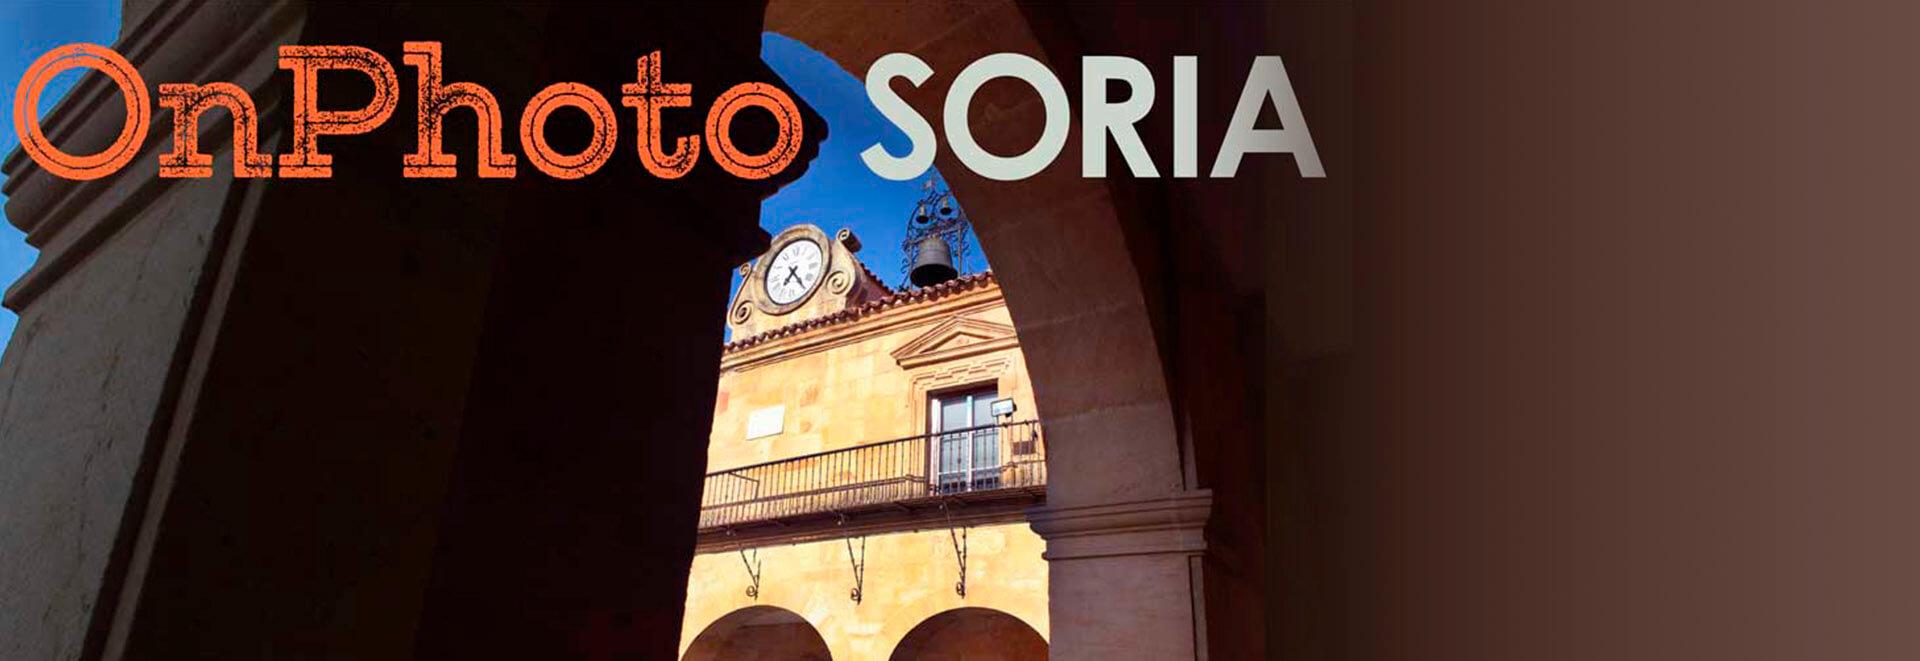 Micological days in Soria